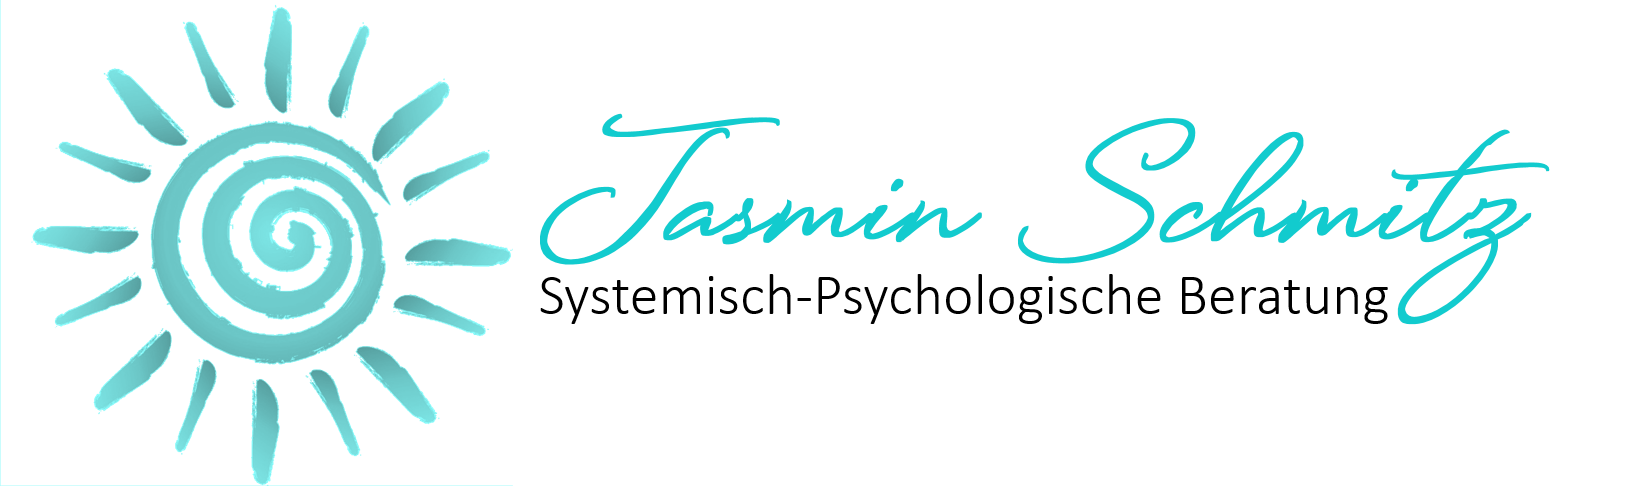 Systemisch-Psychologische Beratung – Jasmin Schmitz